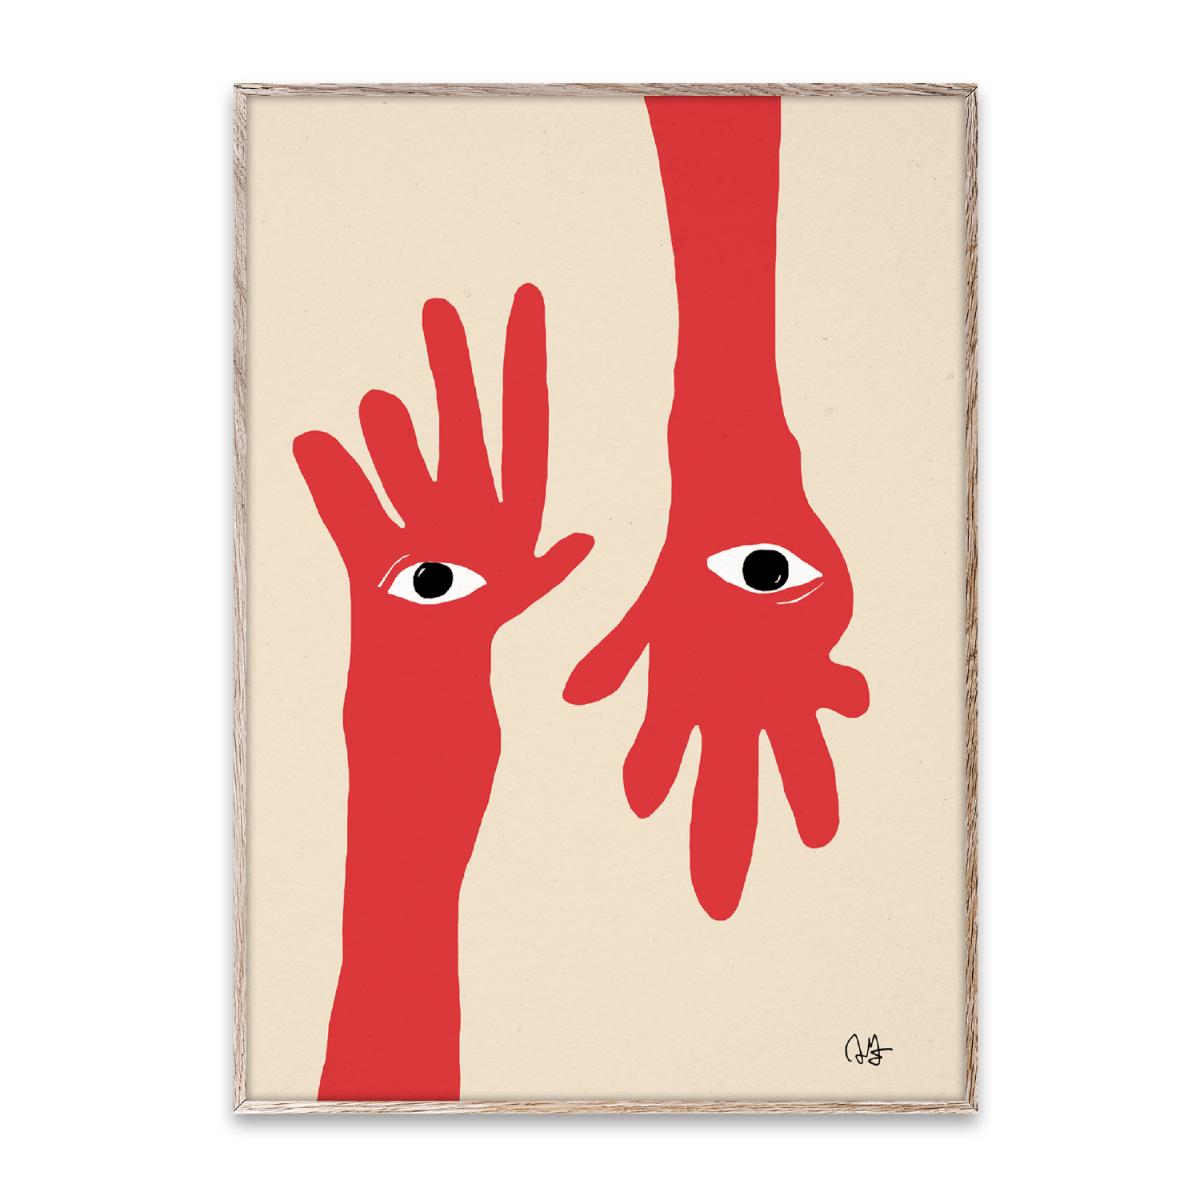 Designtorget Poster Hamsa Hands 30x40 cm